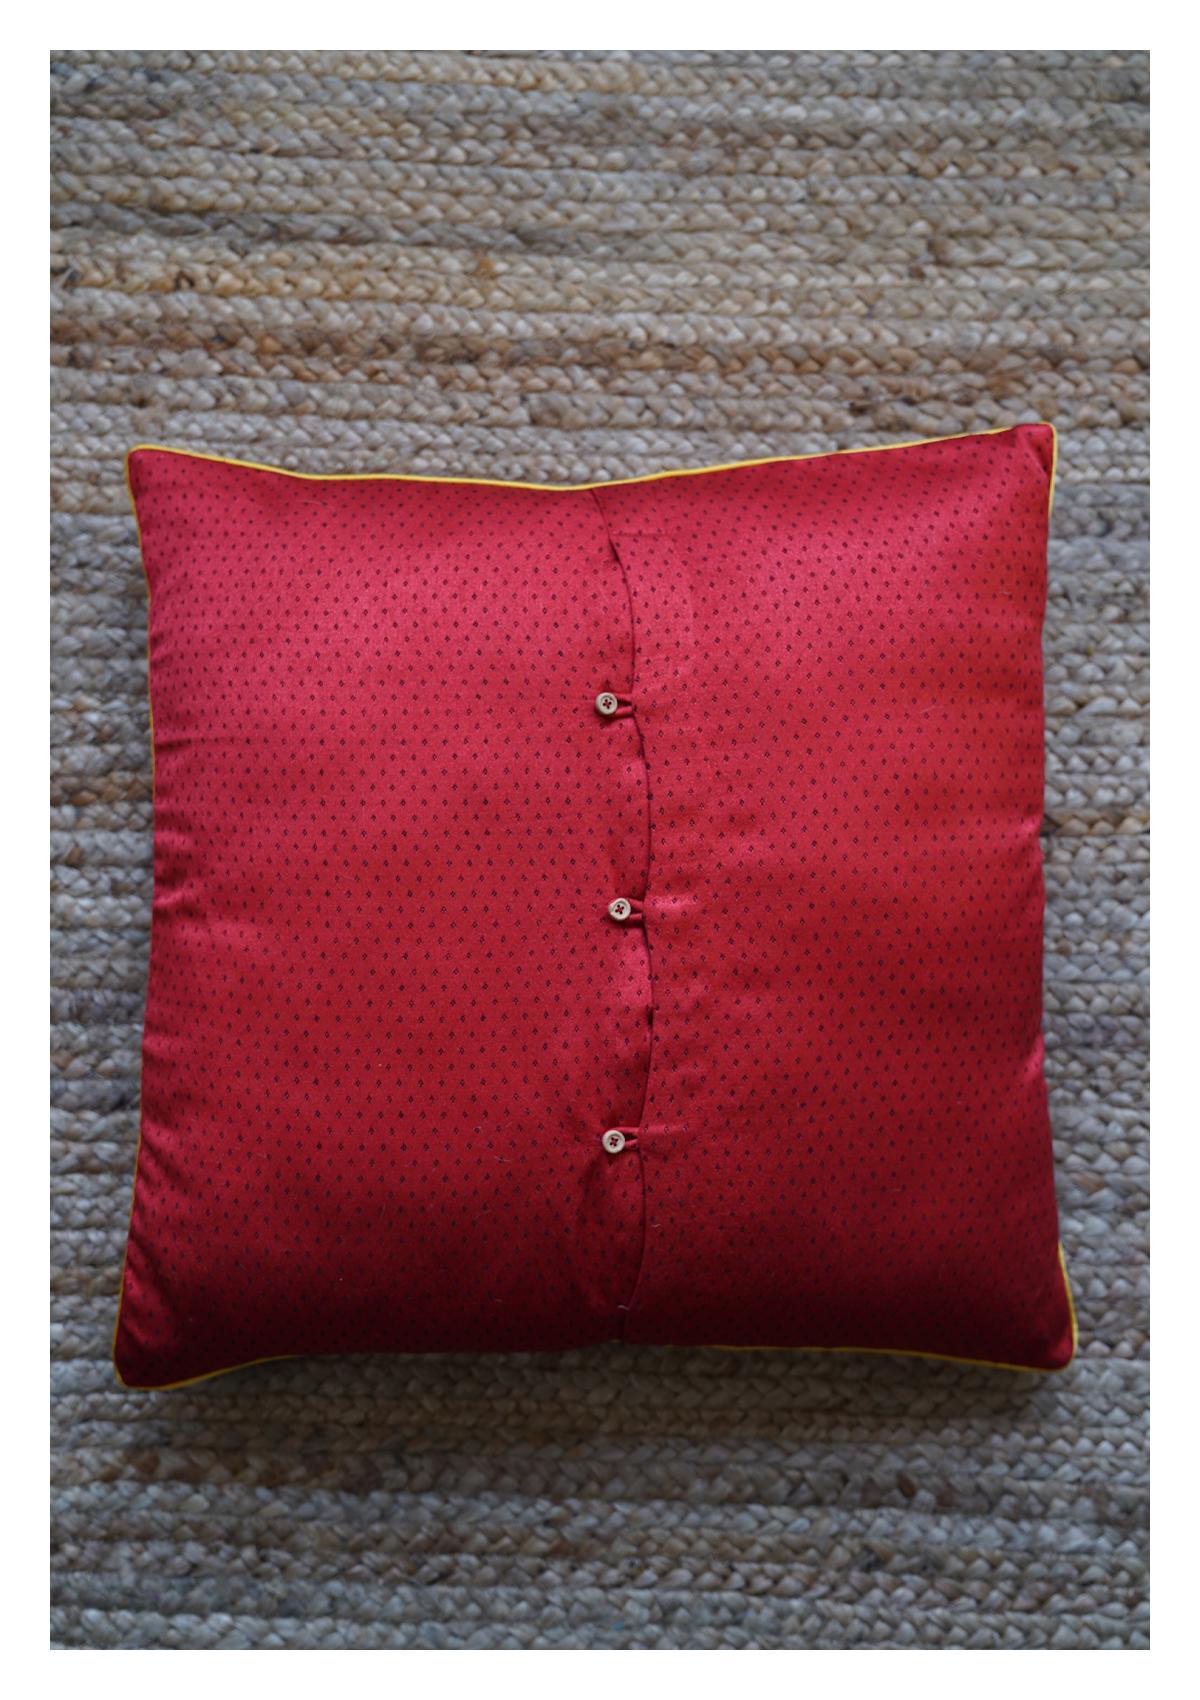 Zindafel Red Mashru Cushion Cover